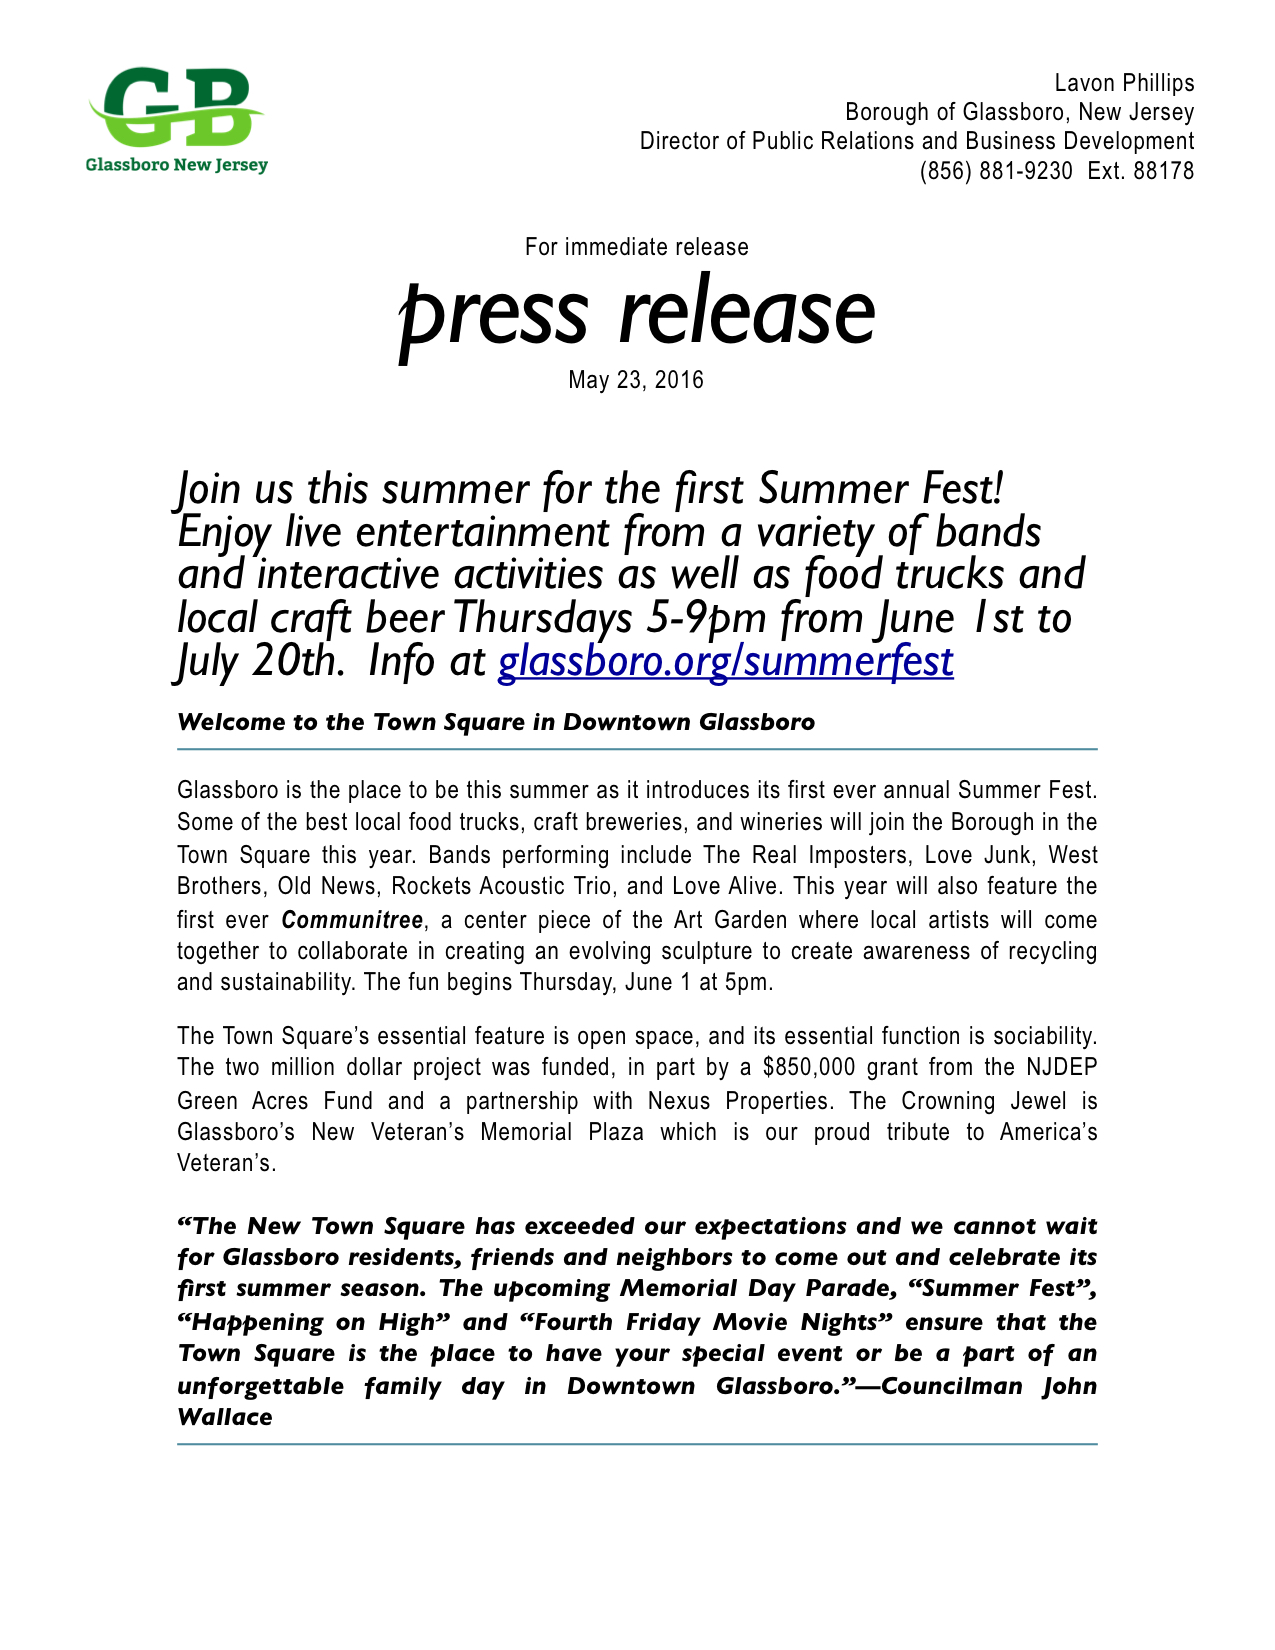 glassboro summer fest press release